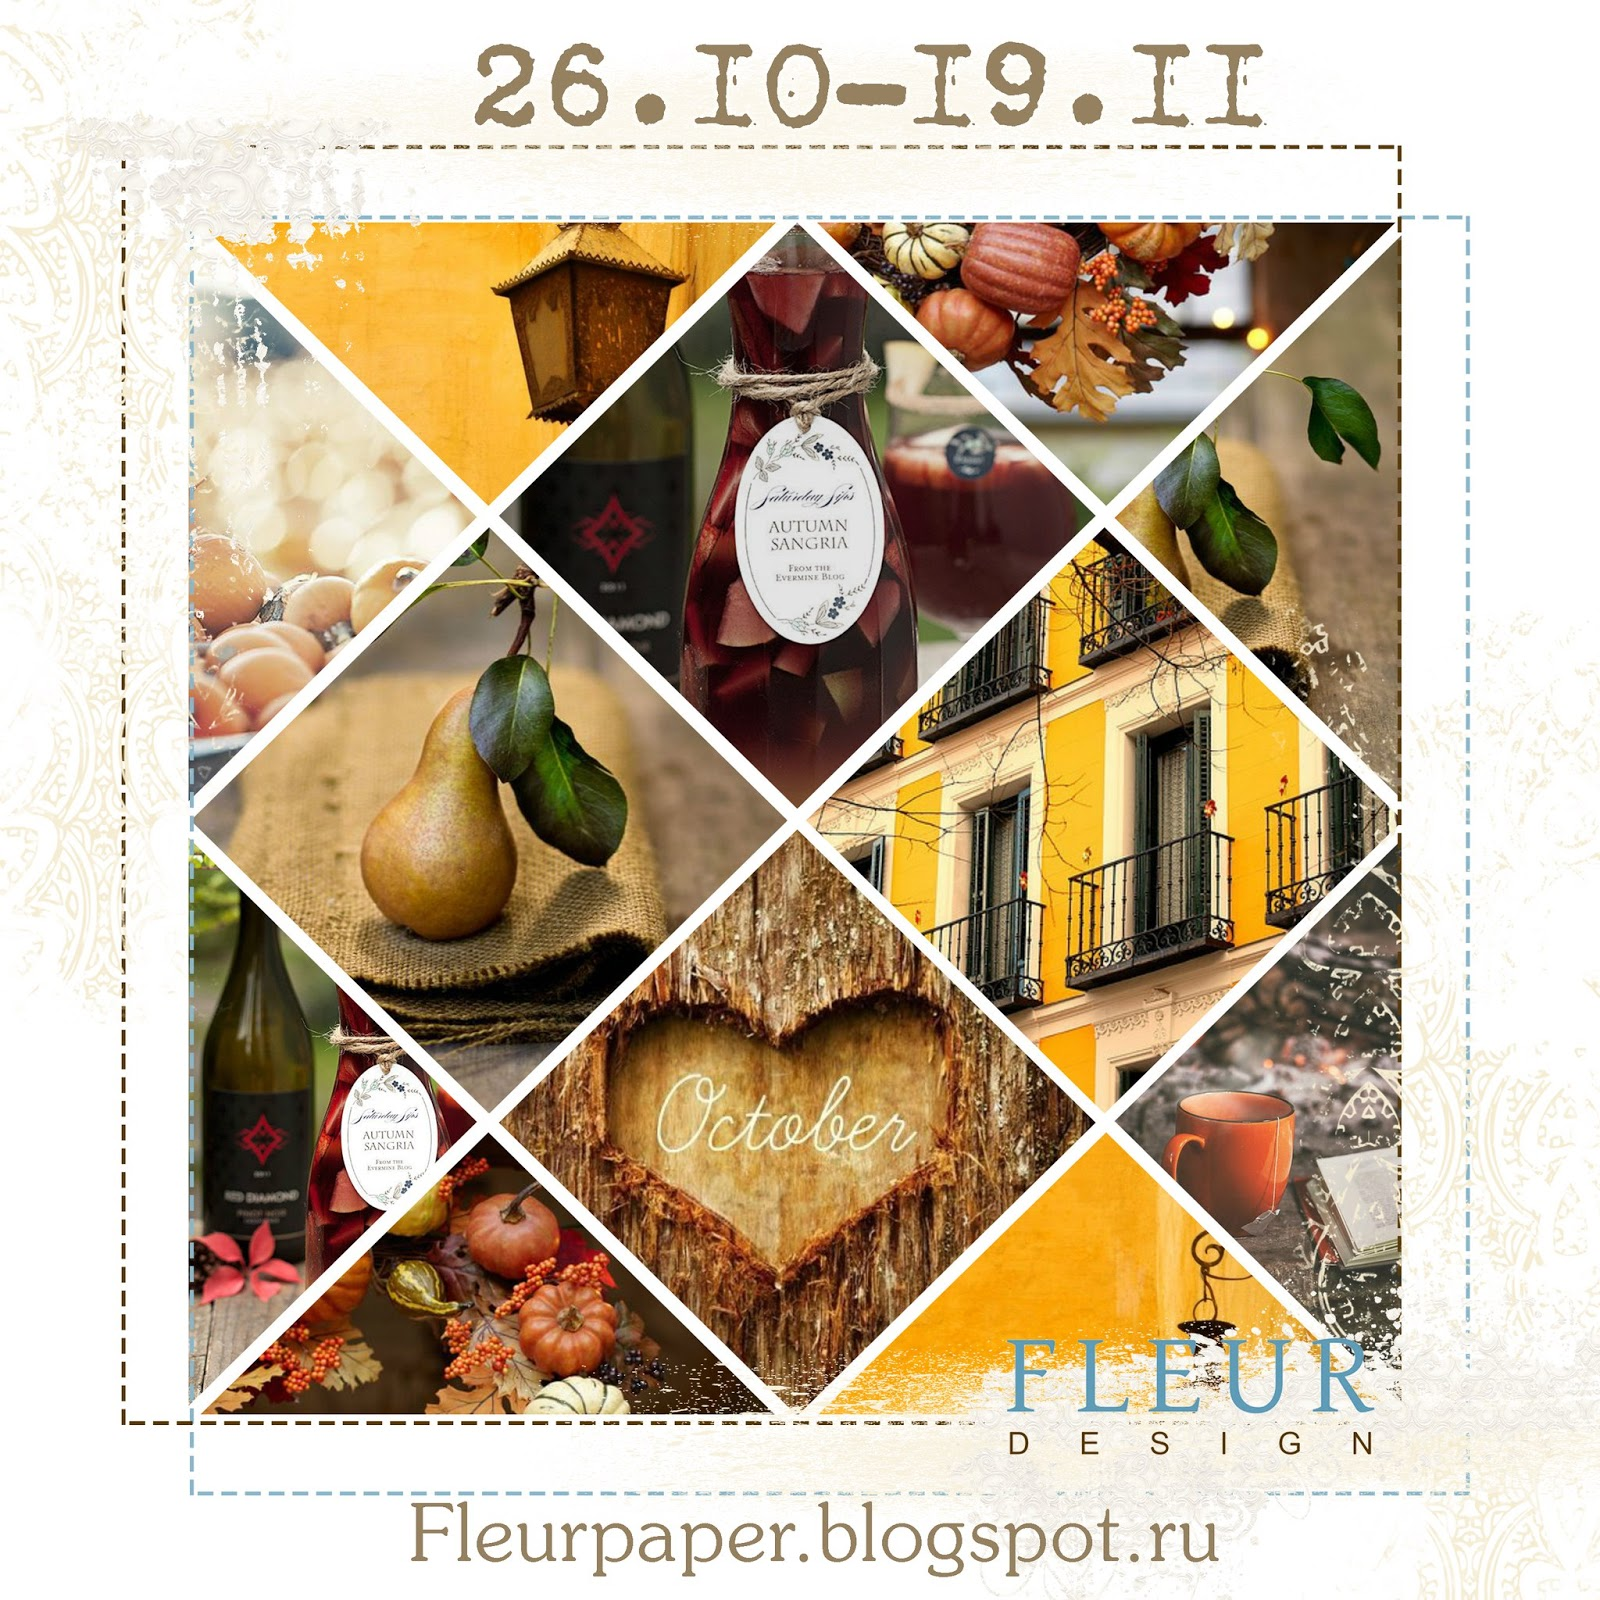 http://fleurpaper.blogspot.com/2015/10/3.html?m=1